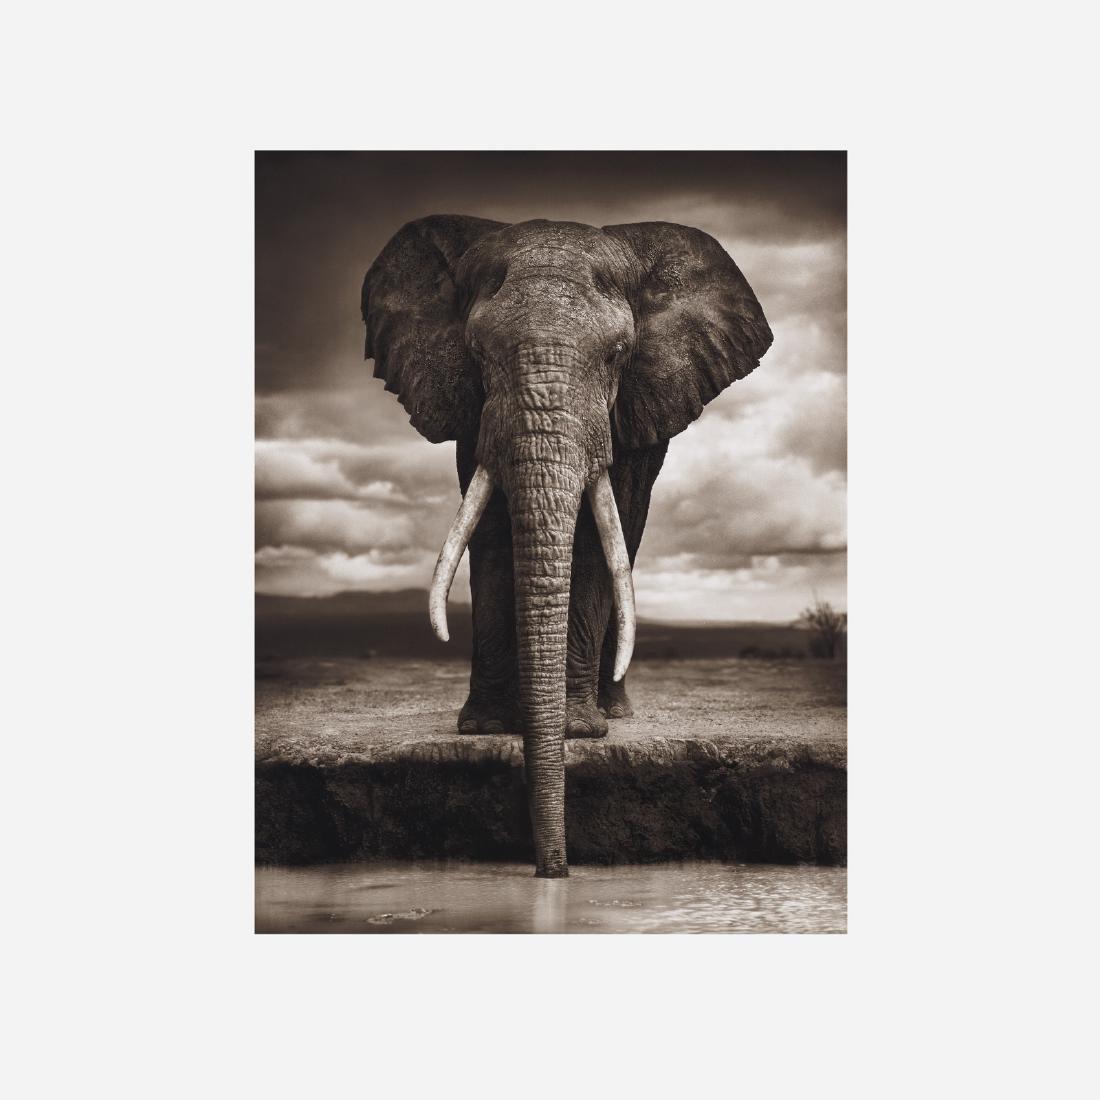 Nick Brandt, Elephant Drinking, Amboseli